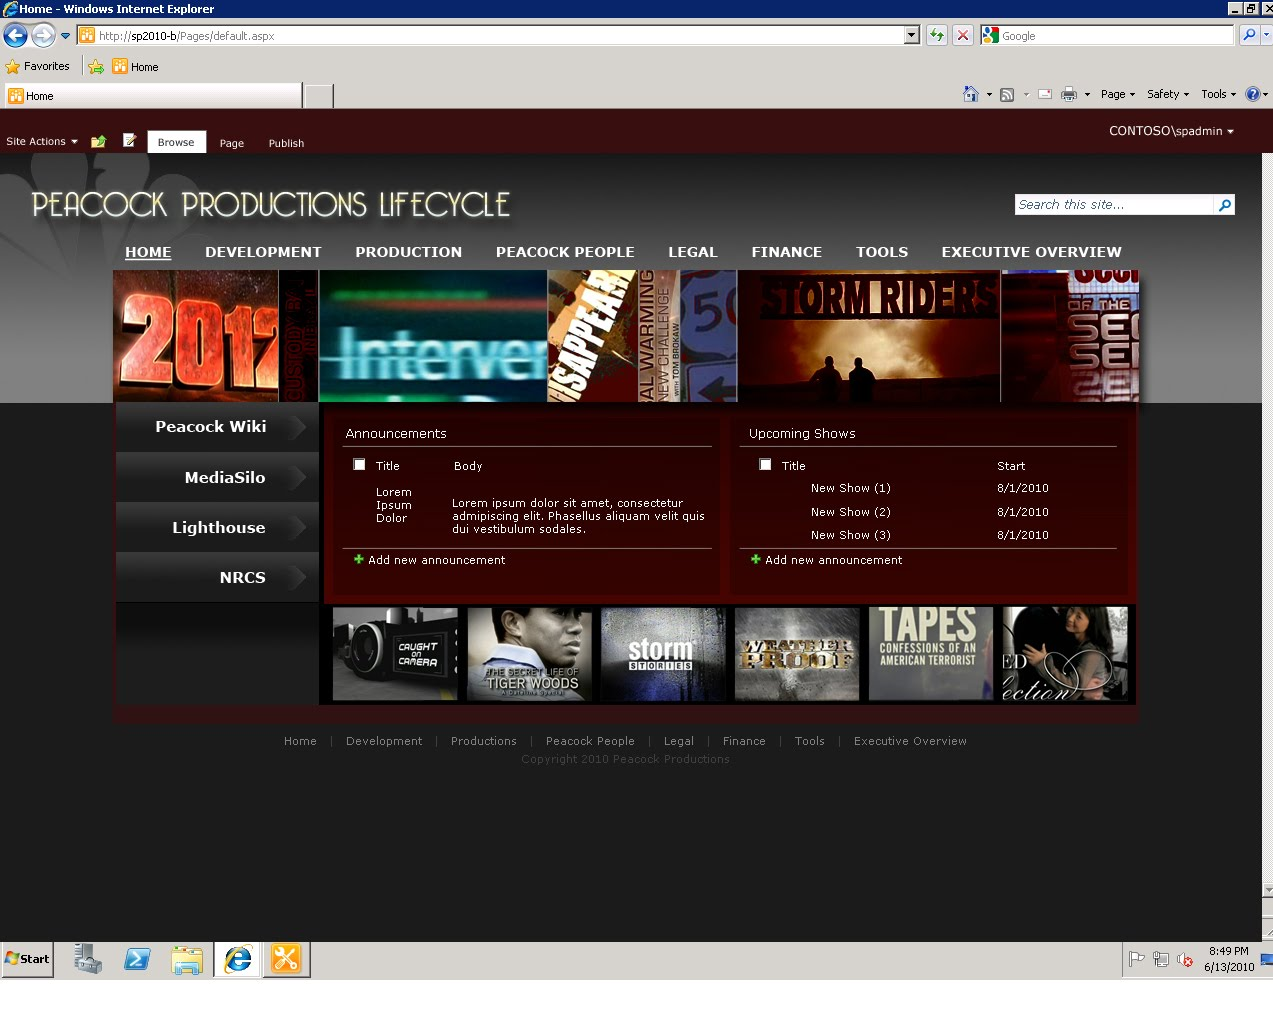 sharepoint 2010 branding templates - celina moser baginski sharepoint branding portfolio nbc